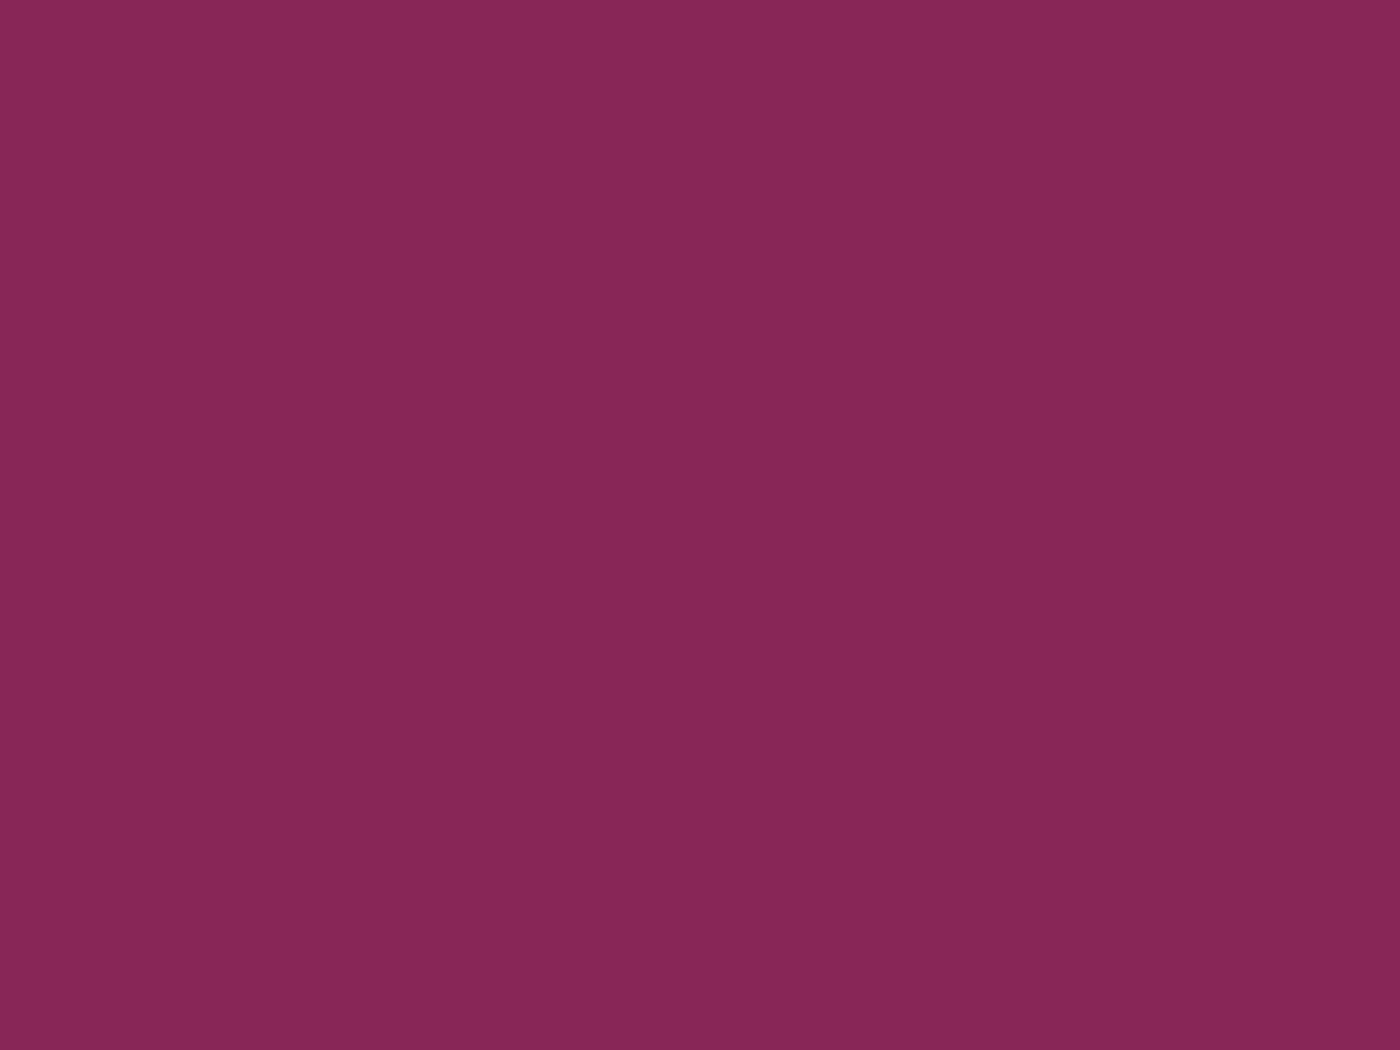 1400x1050 dark raspberry solid color background pattern. Black Bedroom Furniture Sets. Home Design Ideas